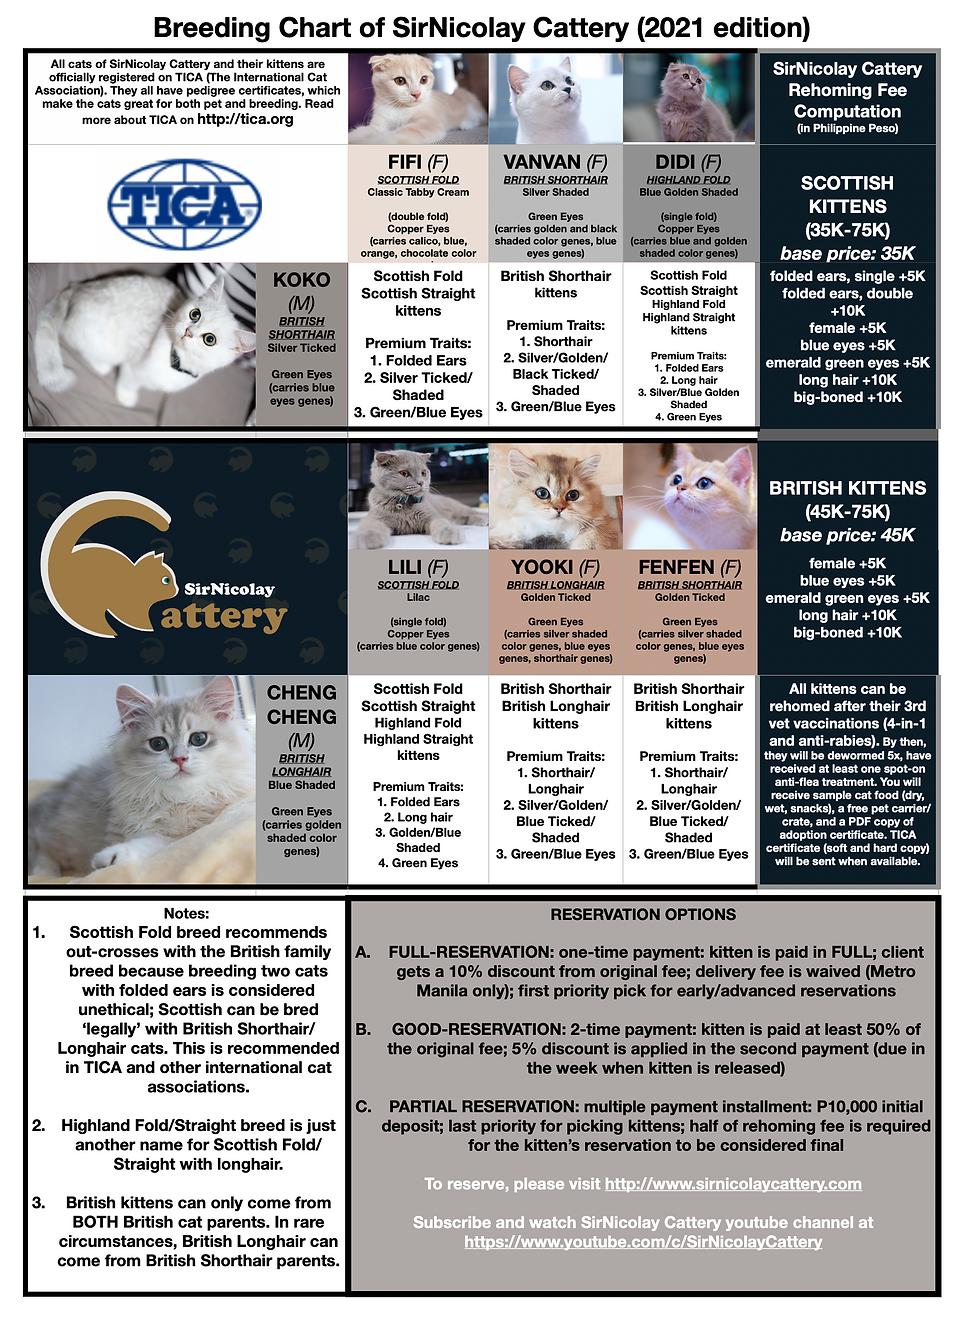 Breeding Chart SirNicolay Cattery 2021 E